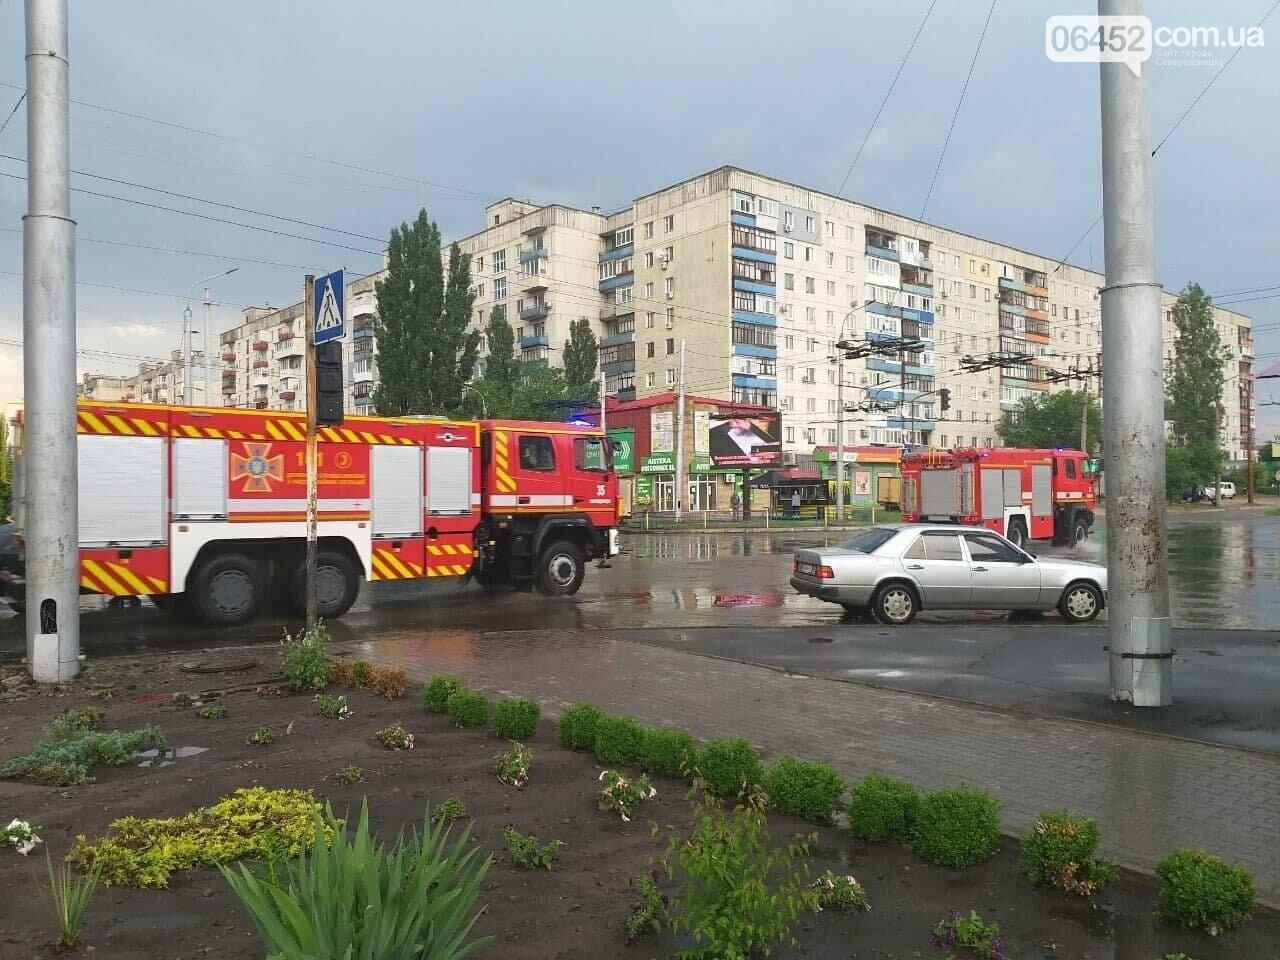 Потоп в квартирах и река в торговом центре: последствия ливня в Северодонецке (фото, видео) , фото-3